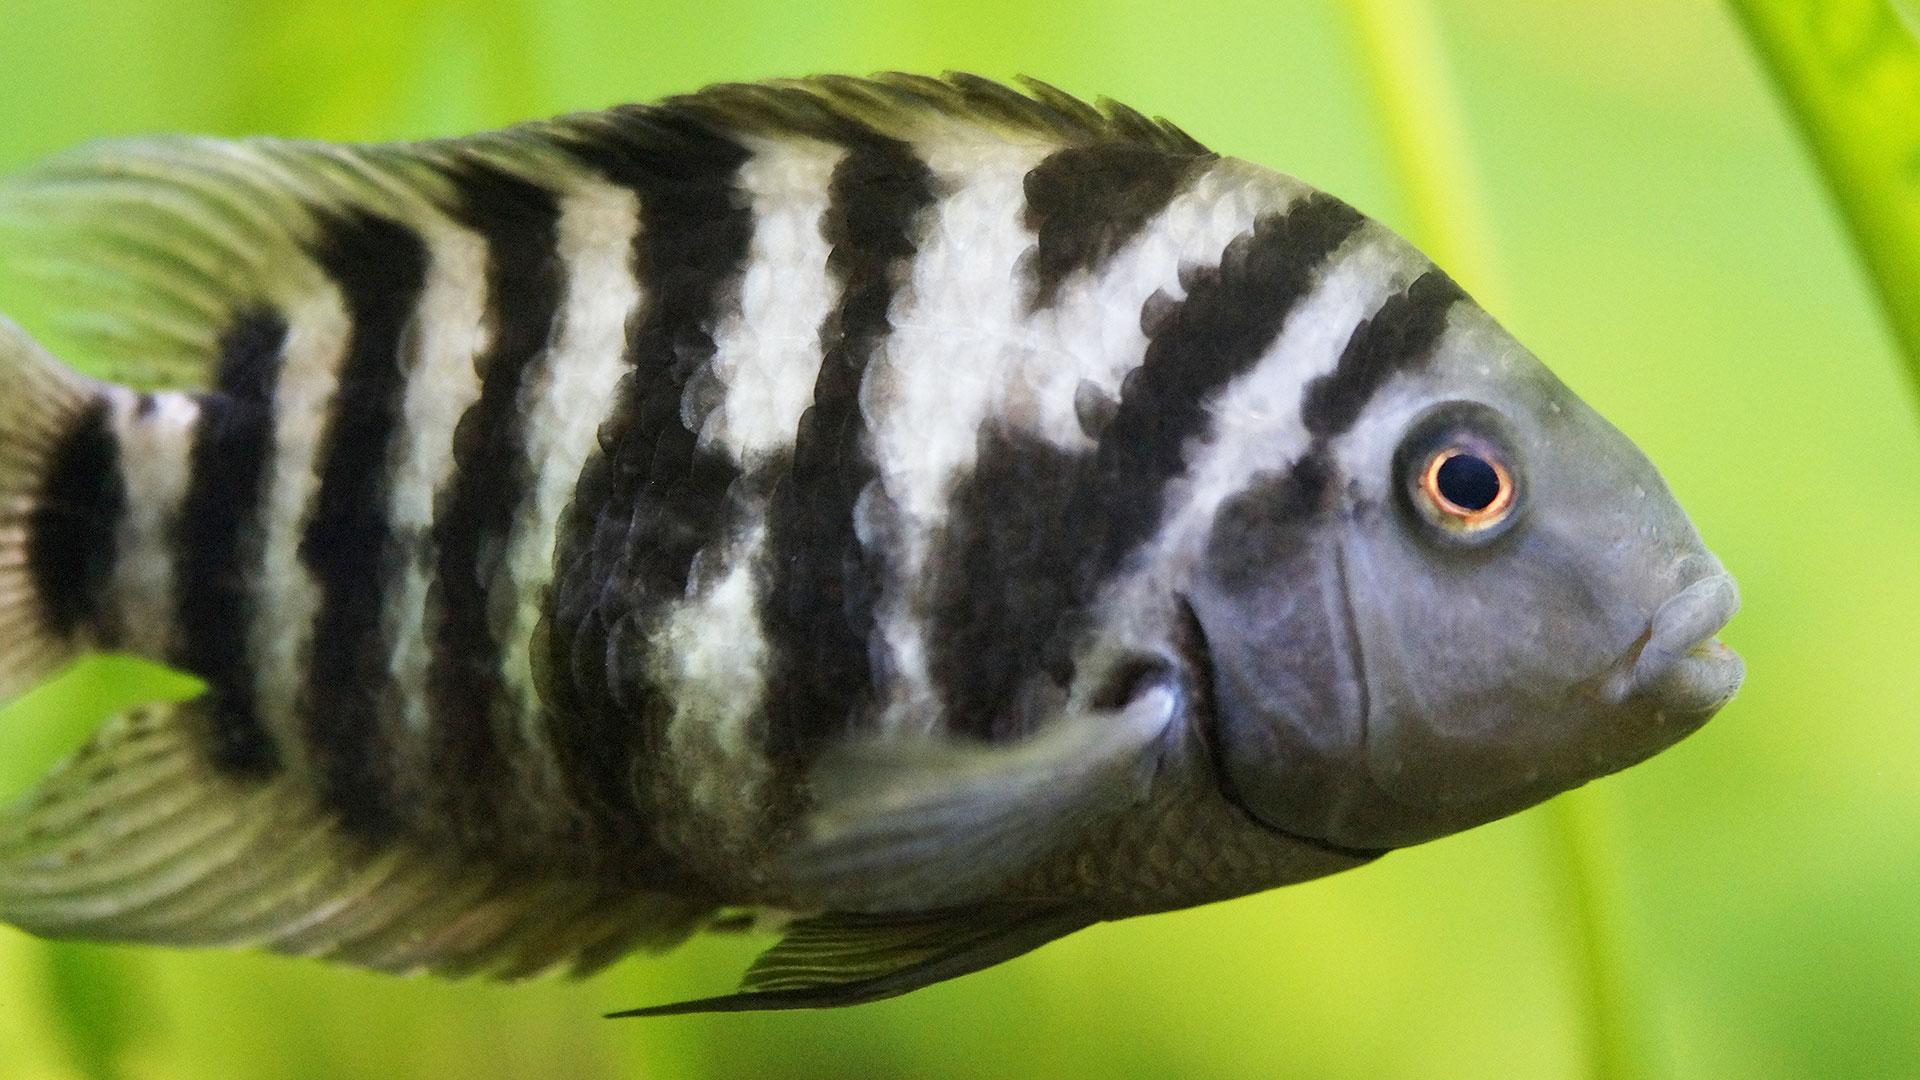 Zebra Chichlid fish - Perch